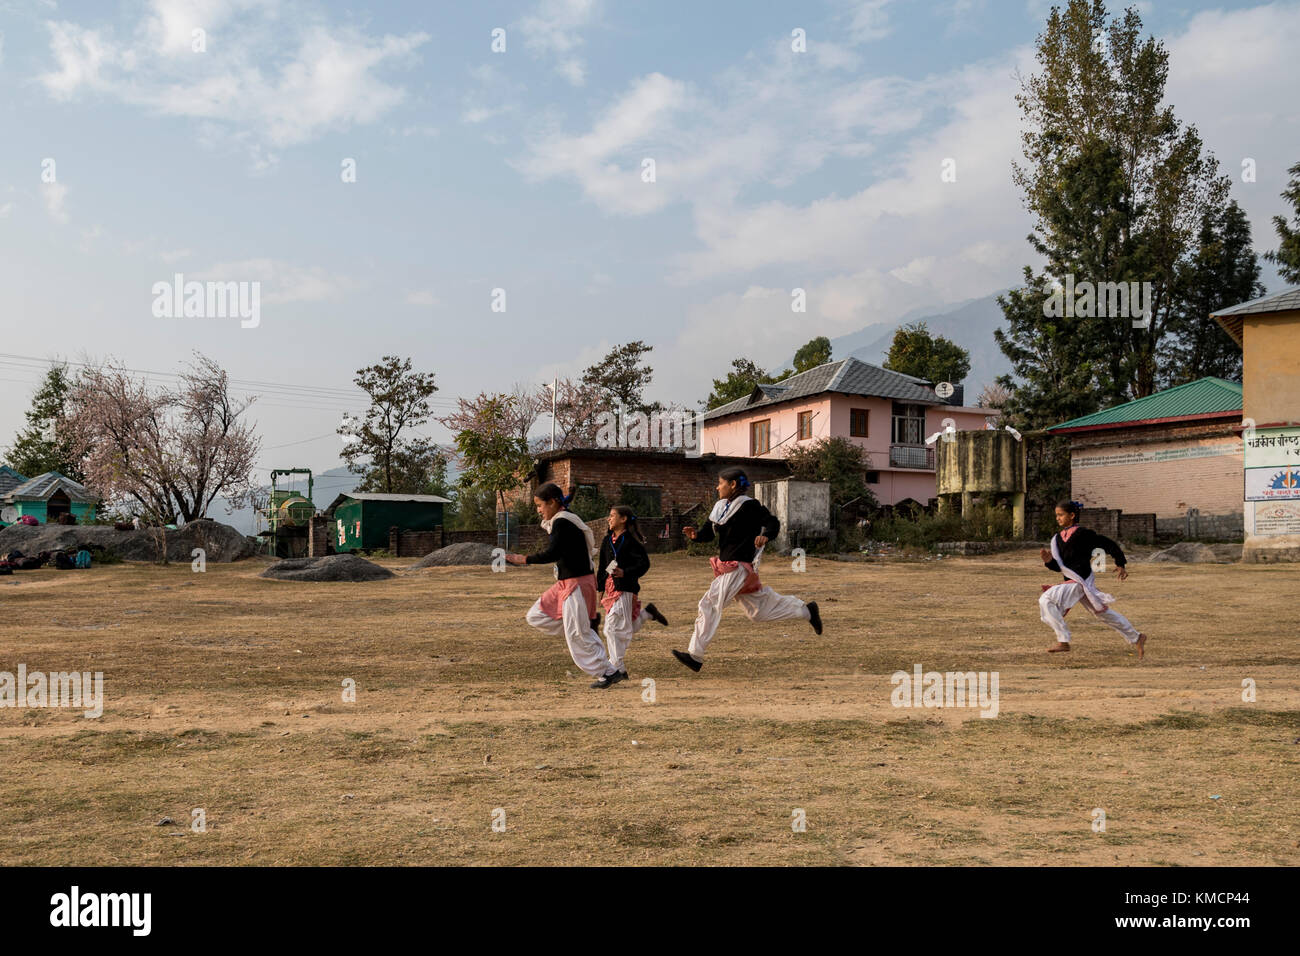 Junge Mädchen im Sport der Tag. Stockbild